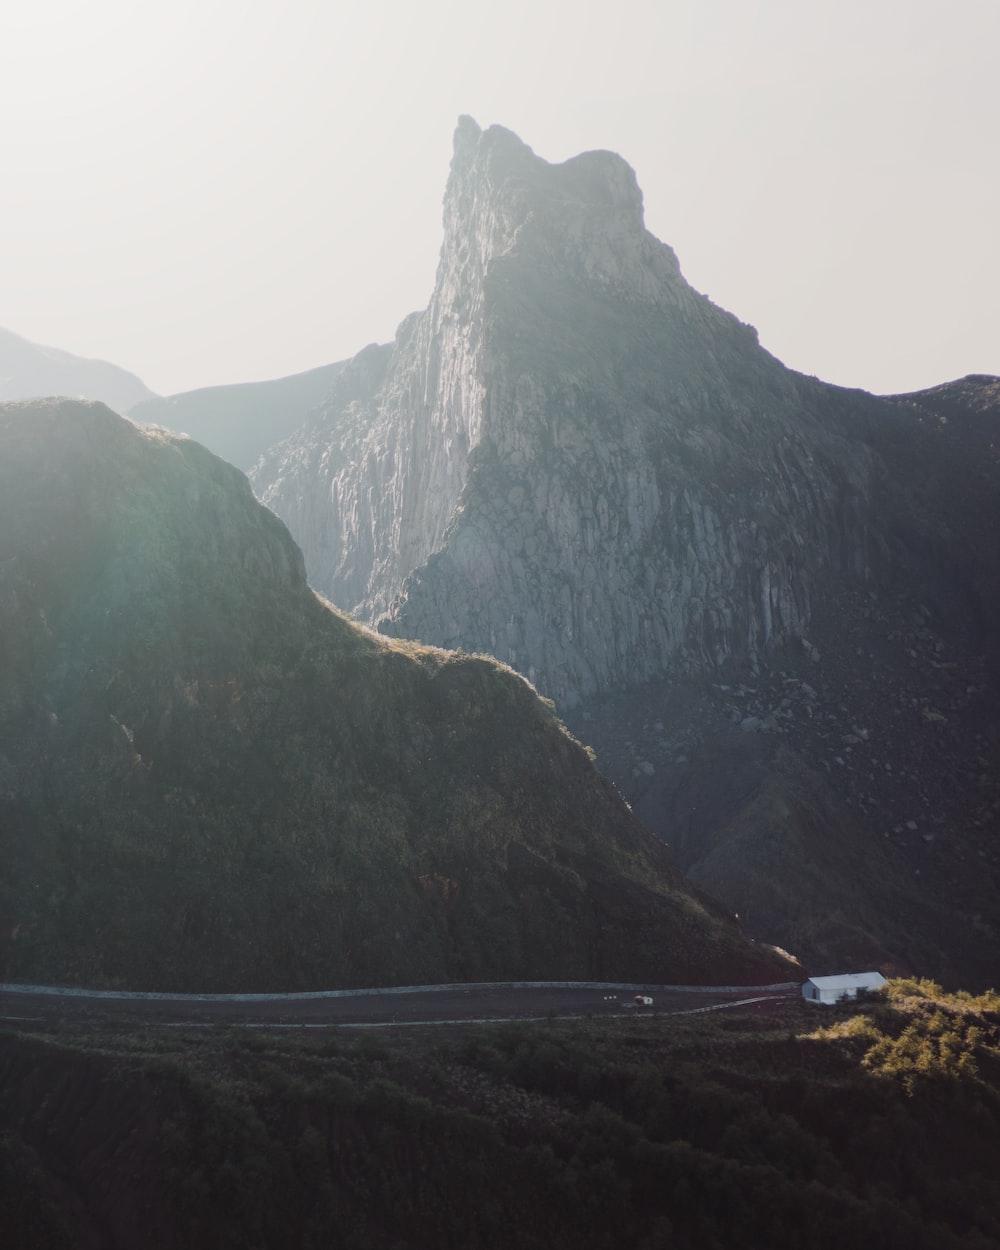 vehicle running on road beside mountain